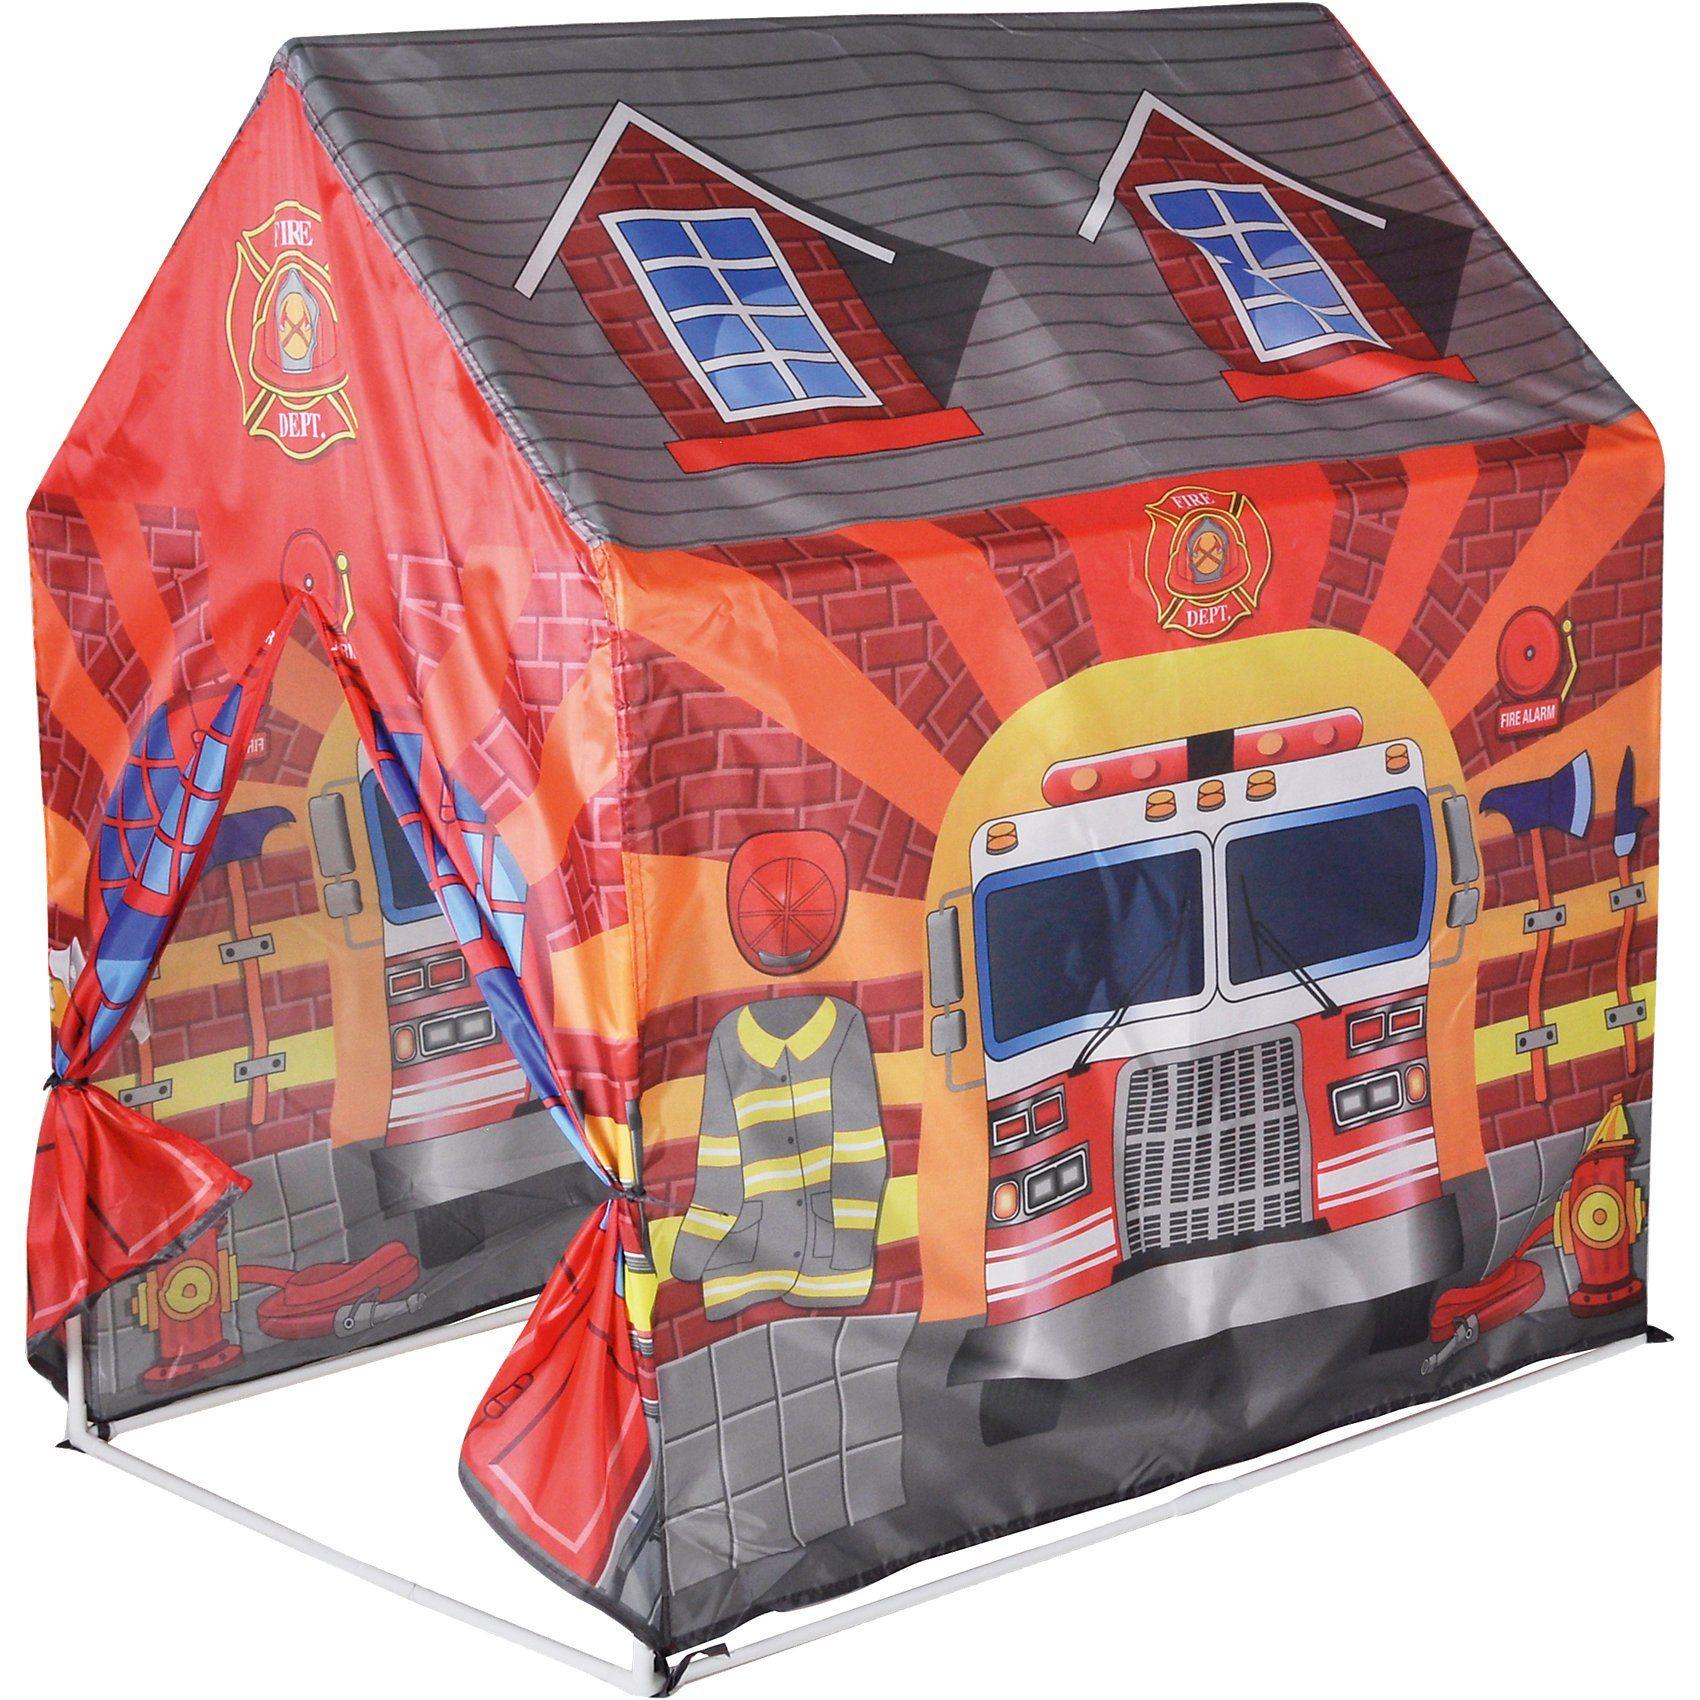 KNORRTOYS.COM Spielzelt Feuerwehrstation